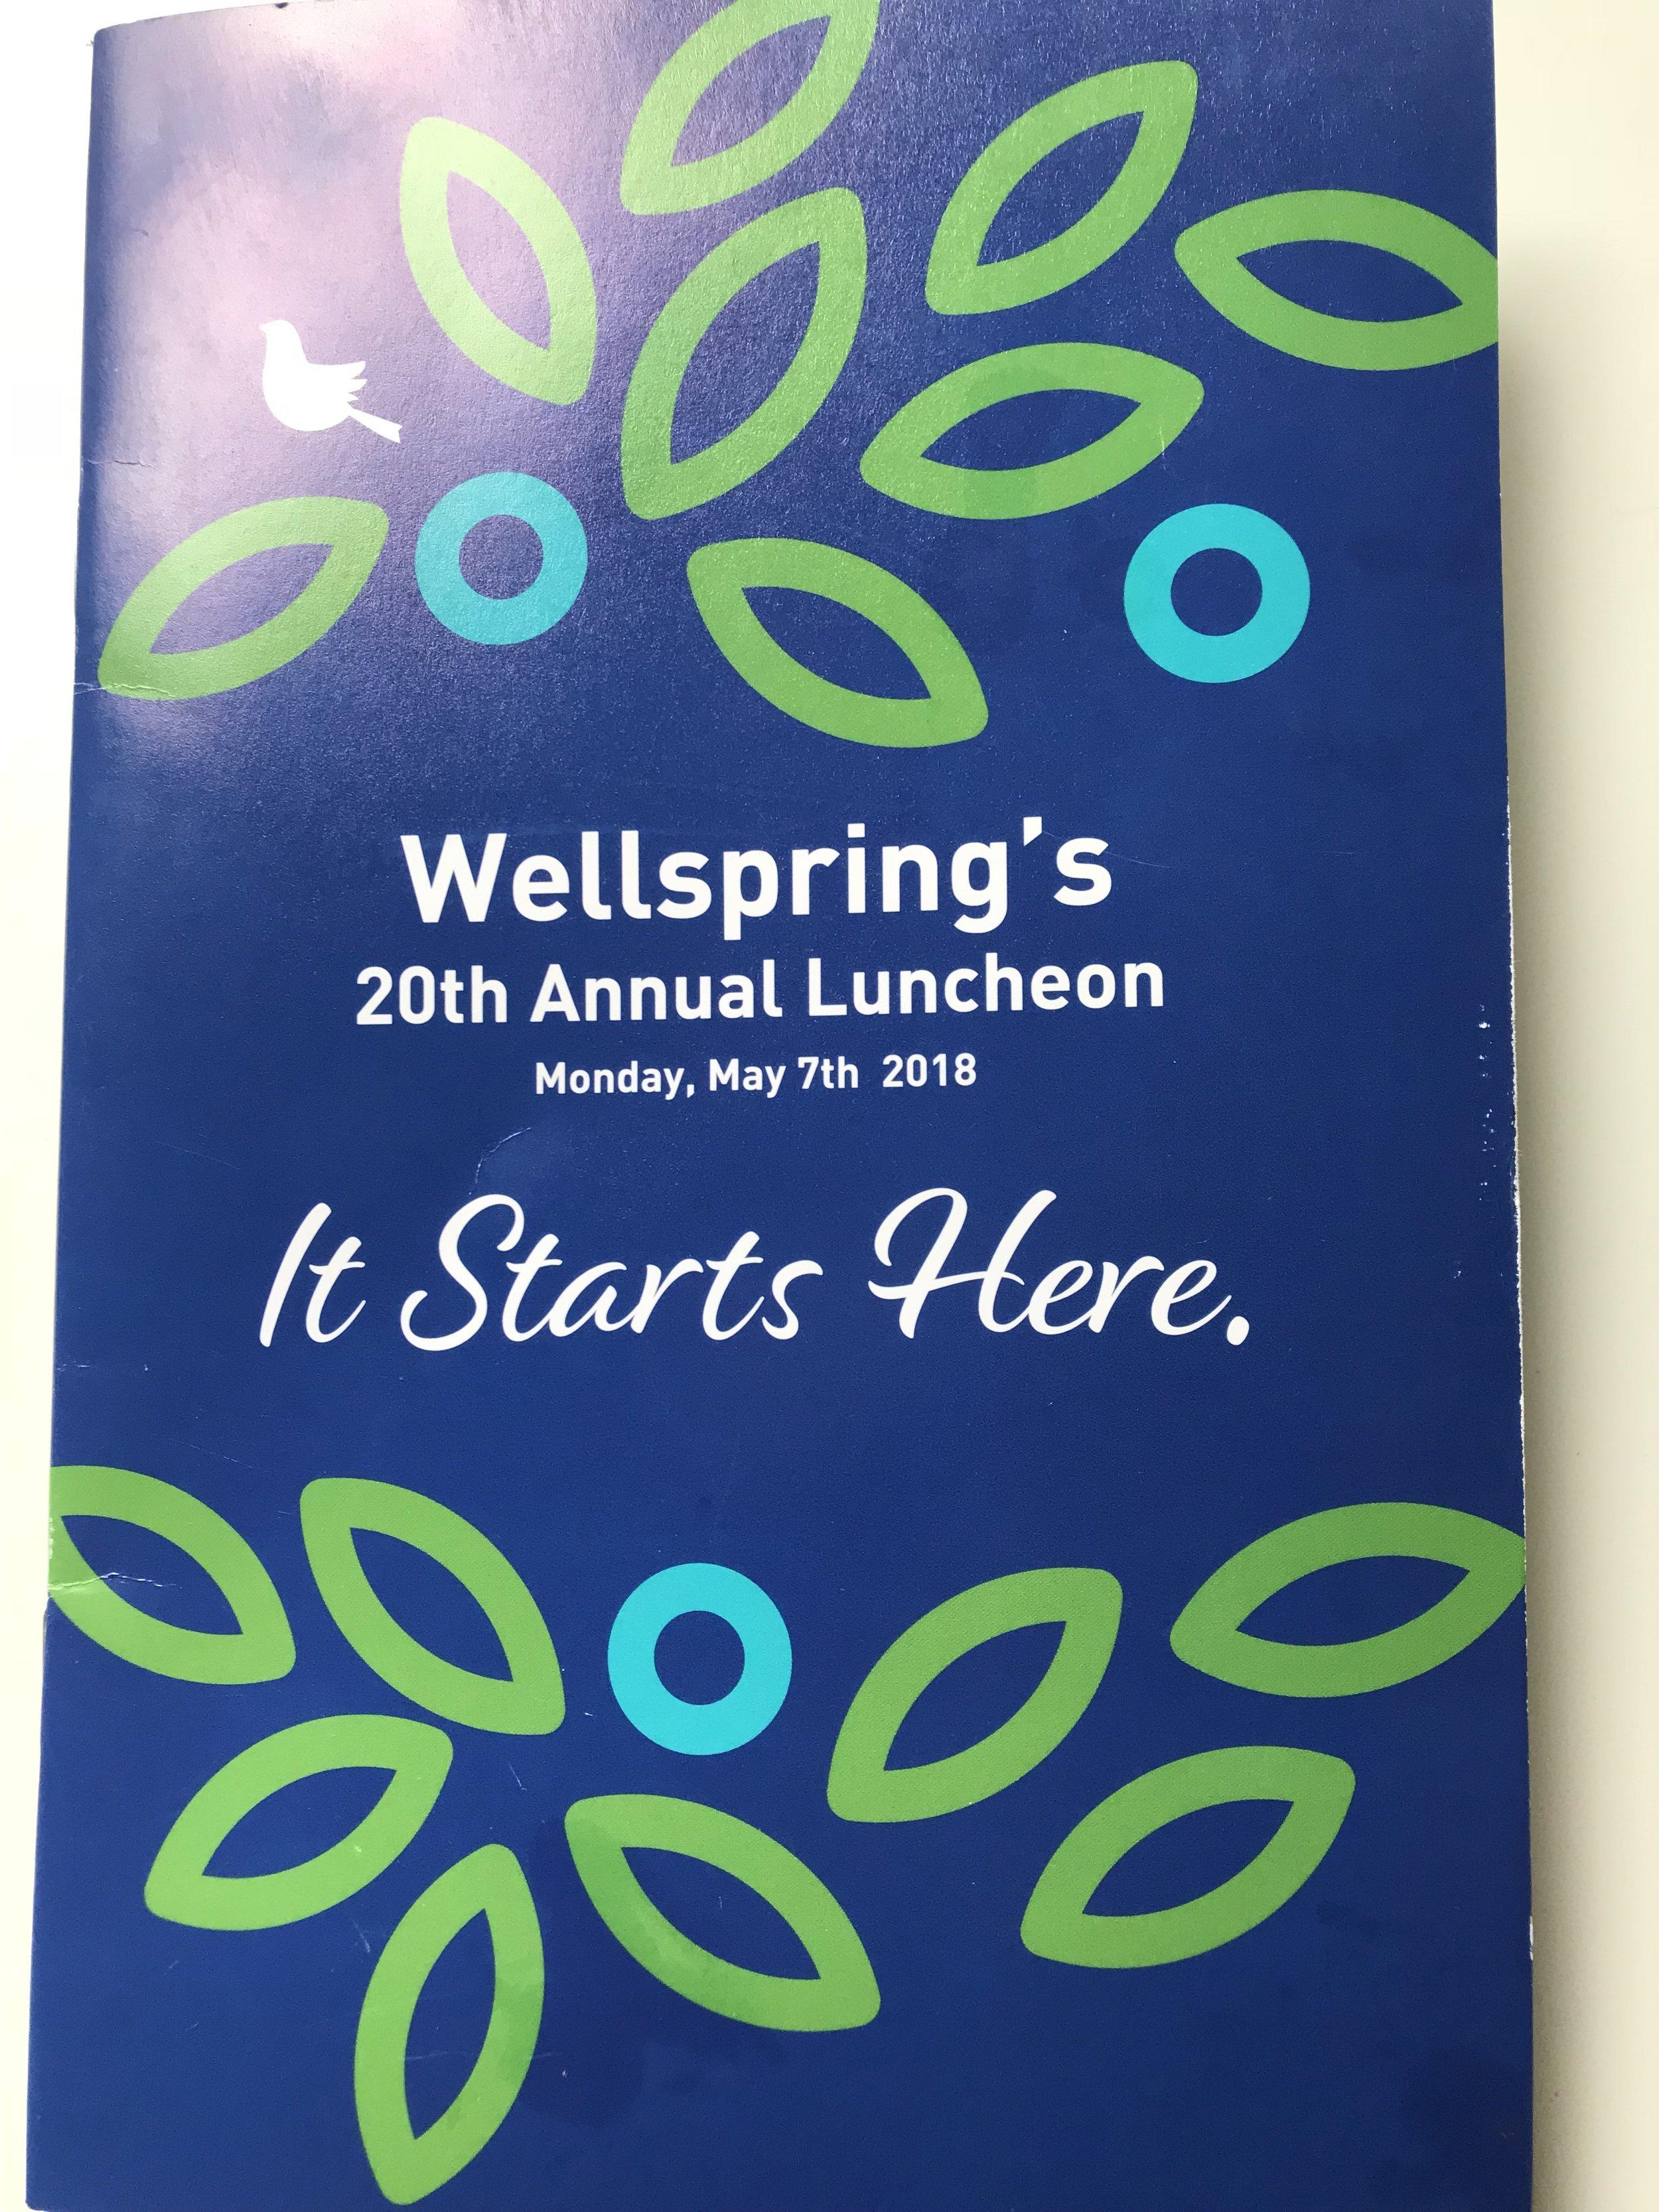 The 2018 Wellspring Luncheon invitation